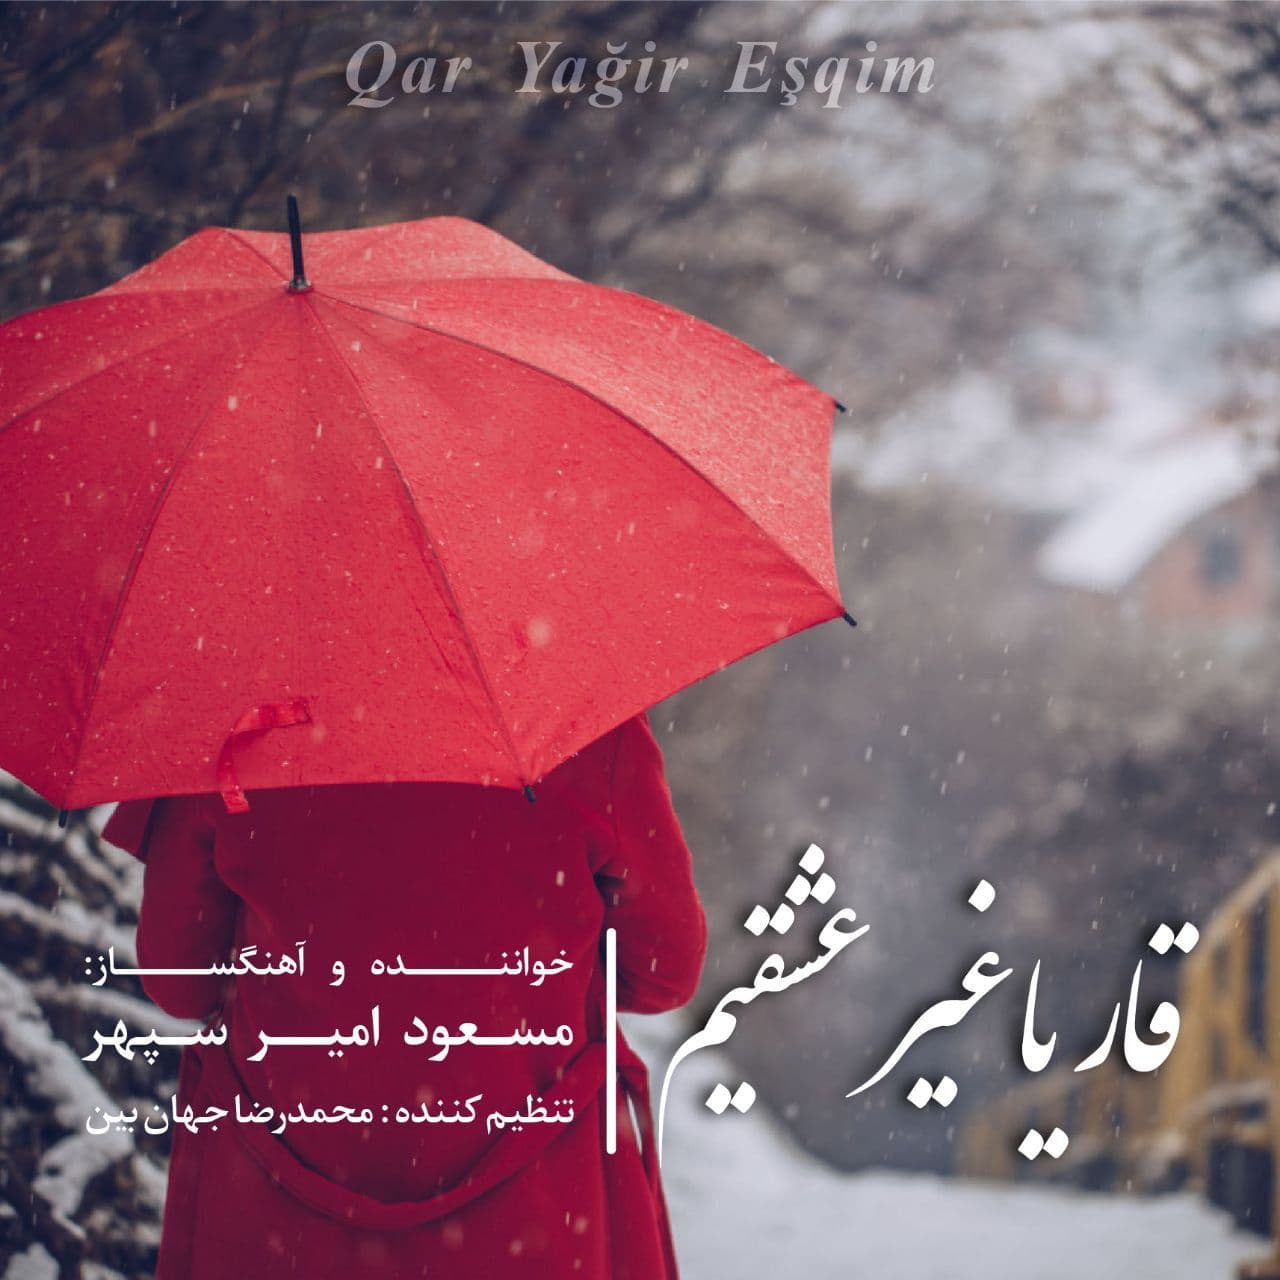 https://s17.picofile.com/file/8427626250/09Masoud_Amir_Sepehr_Qar_Yagir_Esqim.jpg